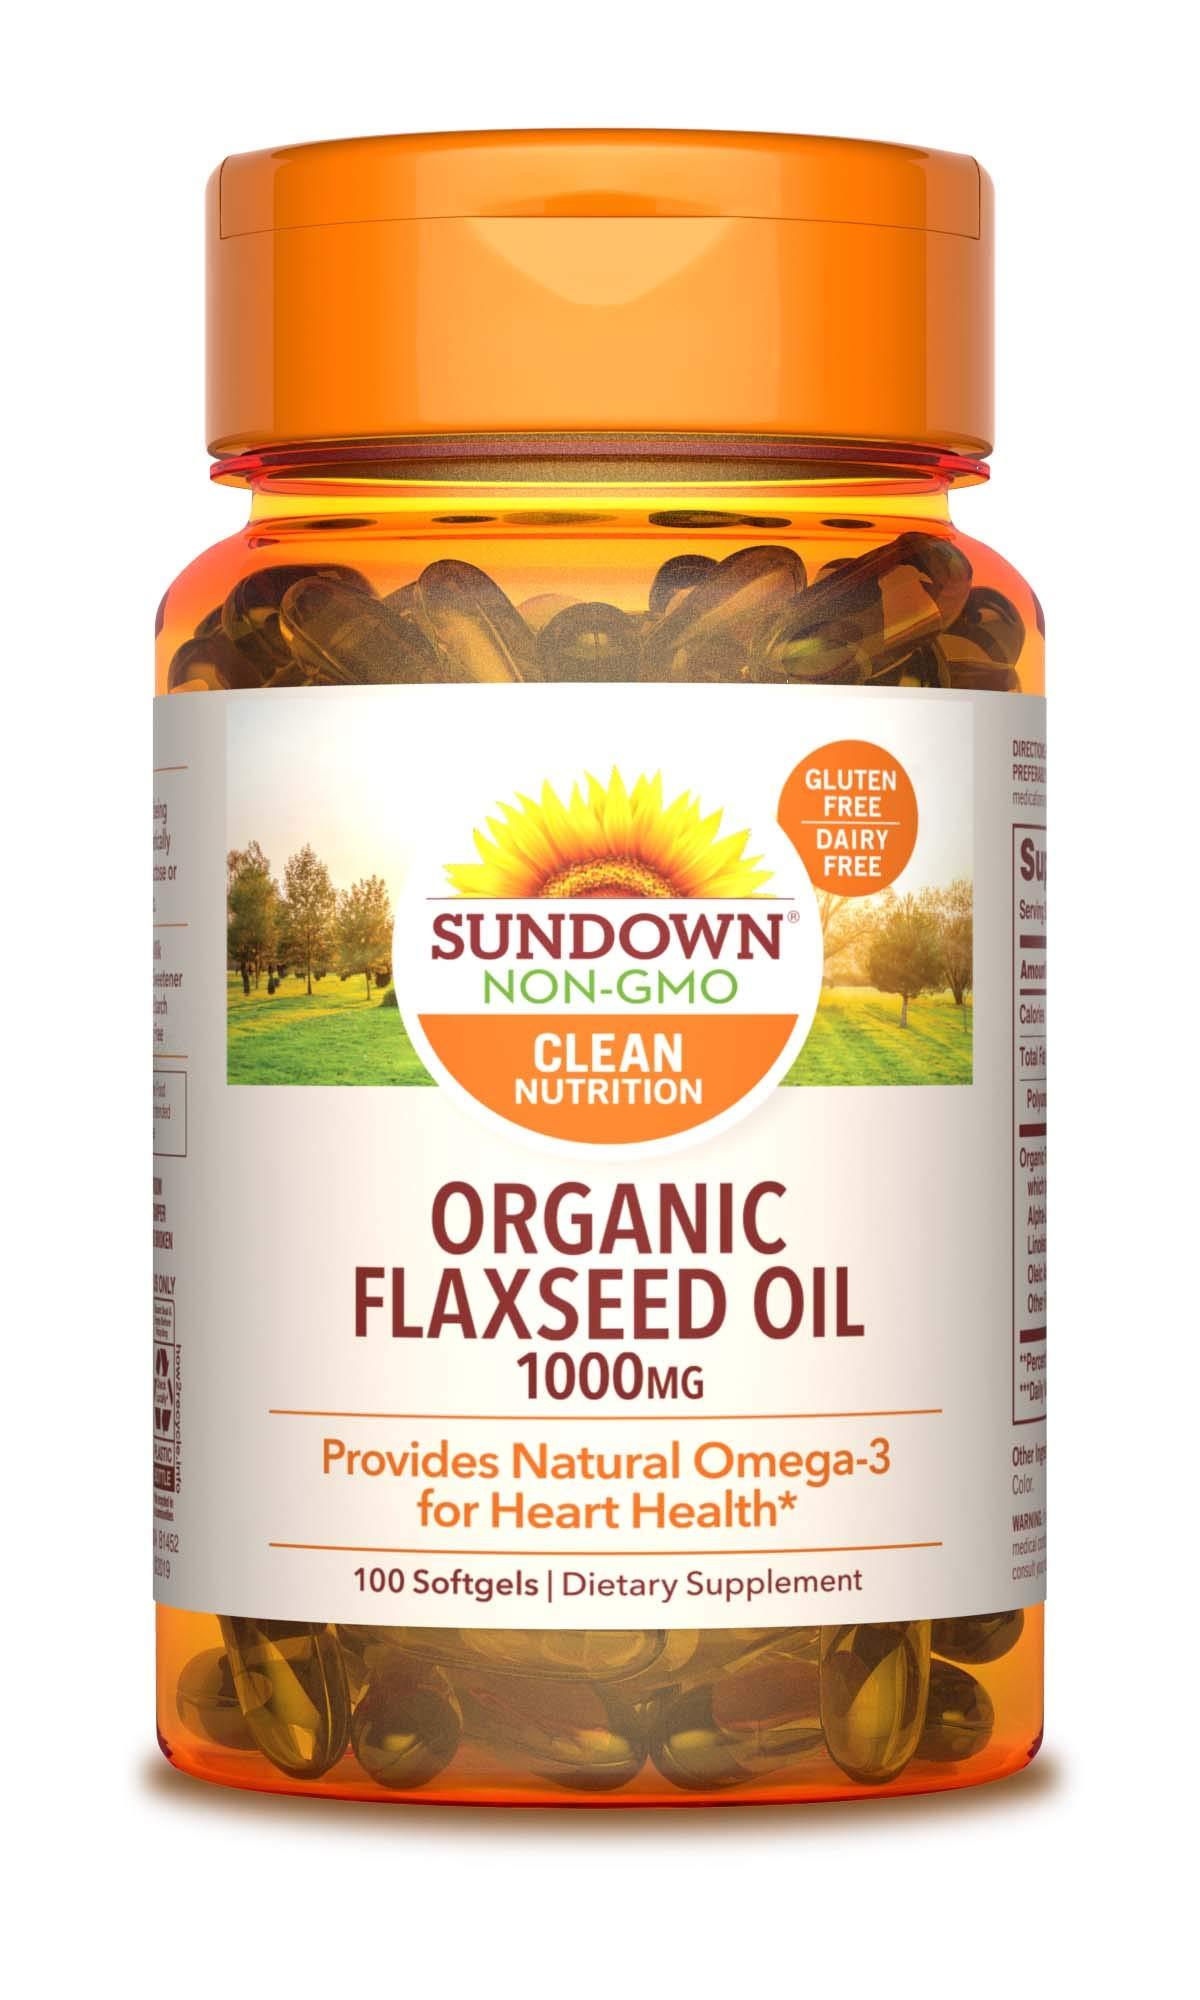 Sundown Naturals Flaxseed Oil 1000 mg, 100 Softgels (Pack of 3)(Packaging May Vary)